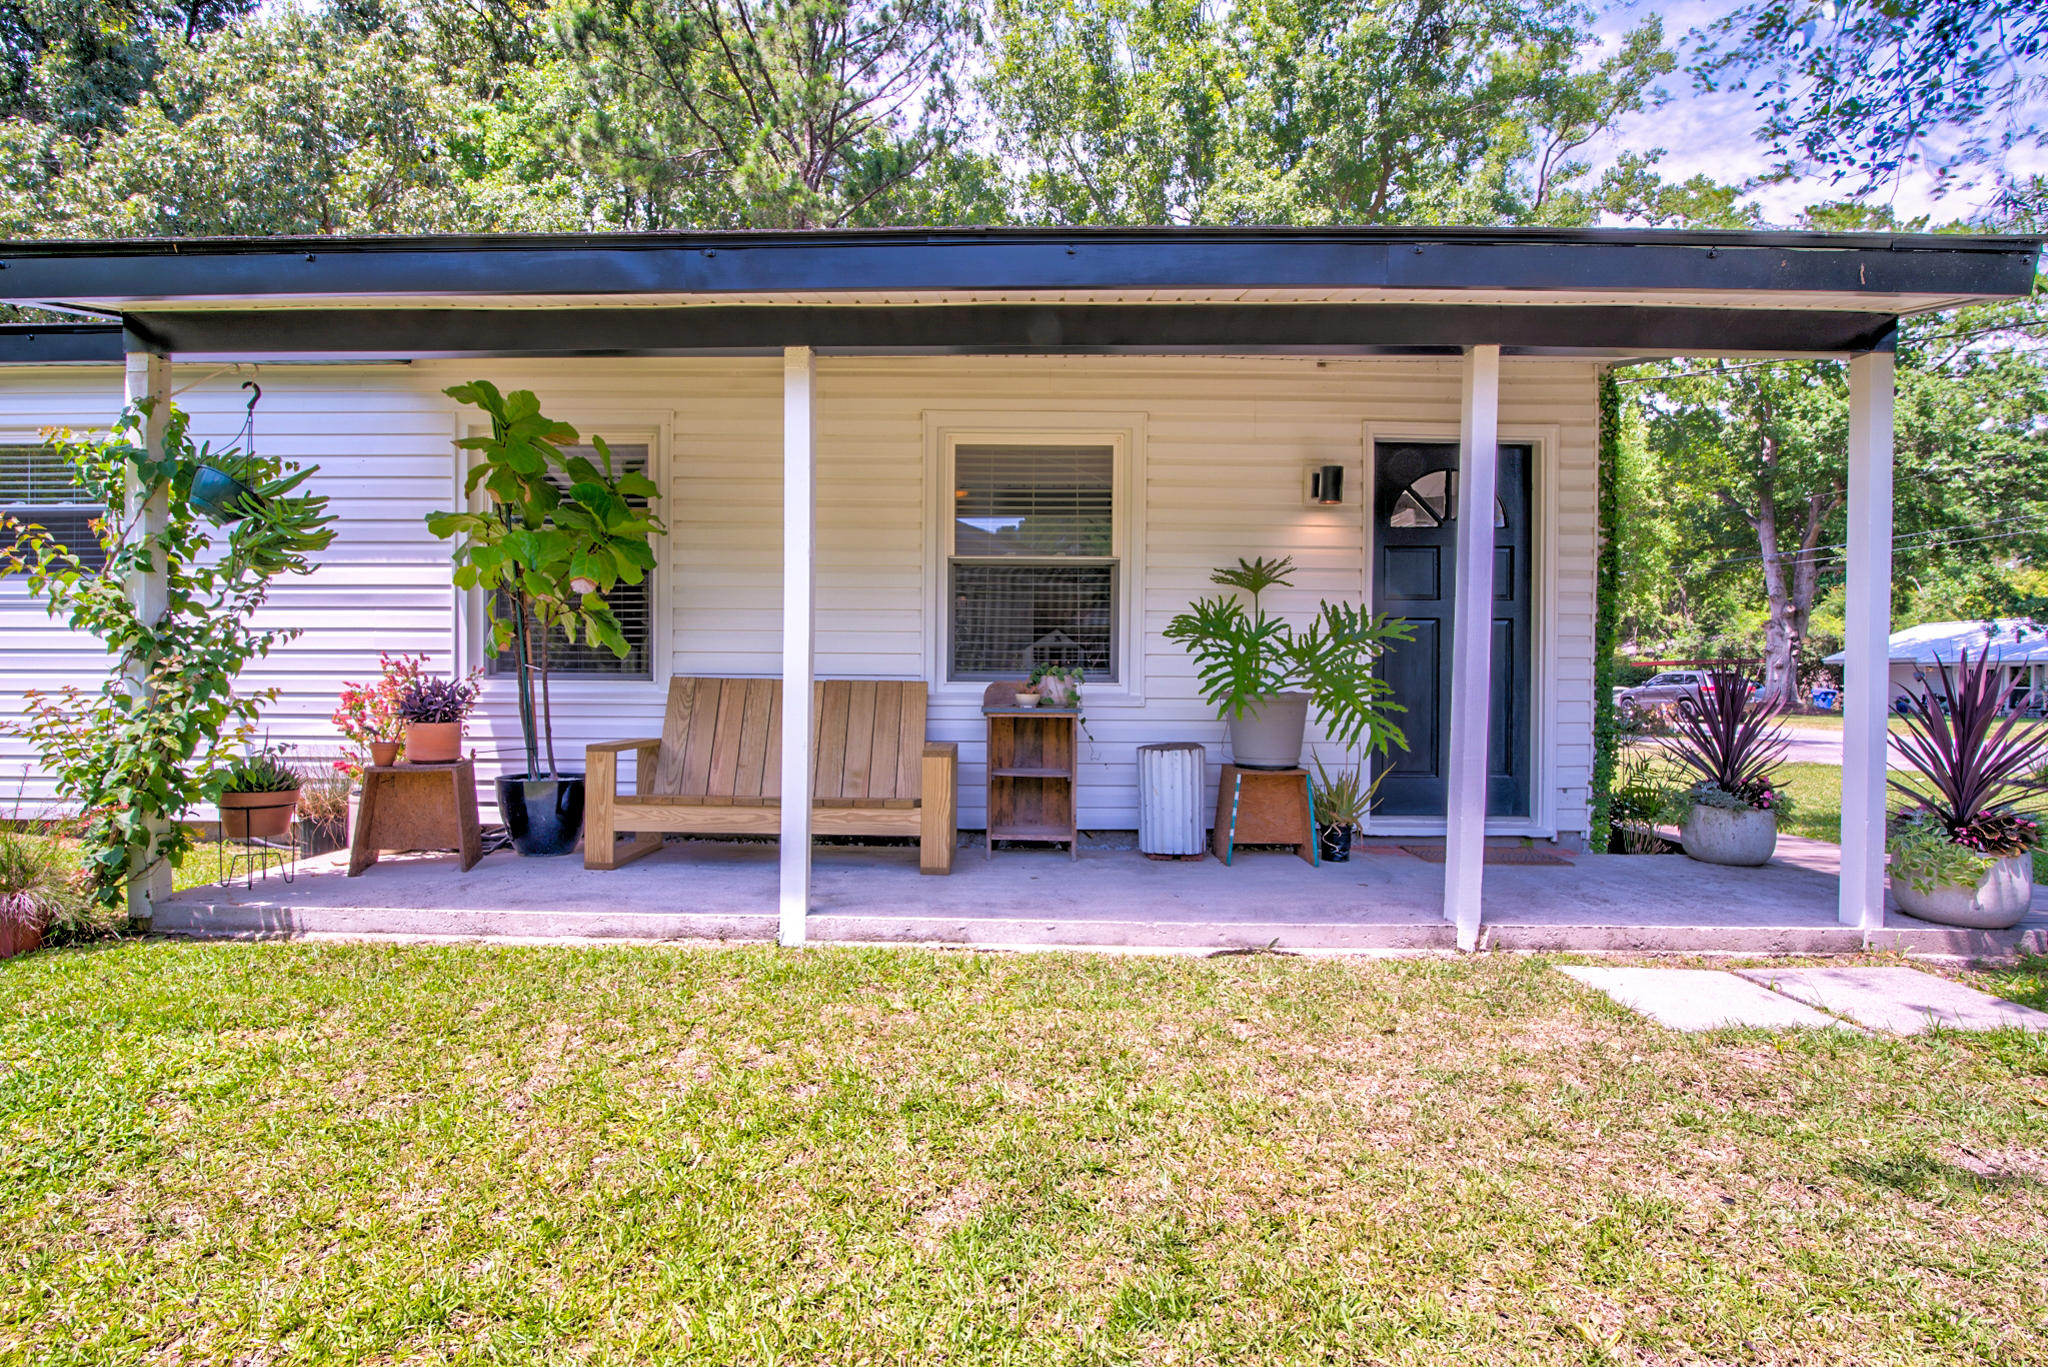 Oakland Homes For Sale - 2131 Clayton, Charleston, SC - 4